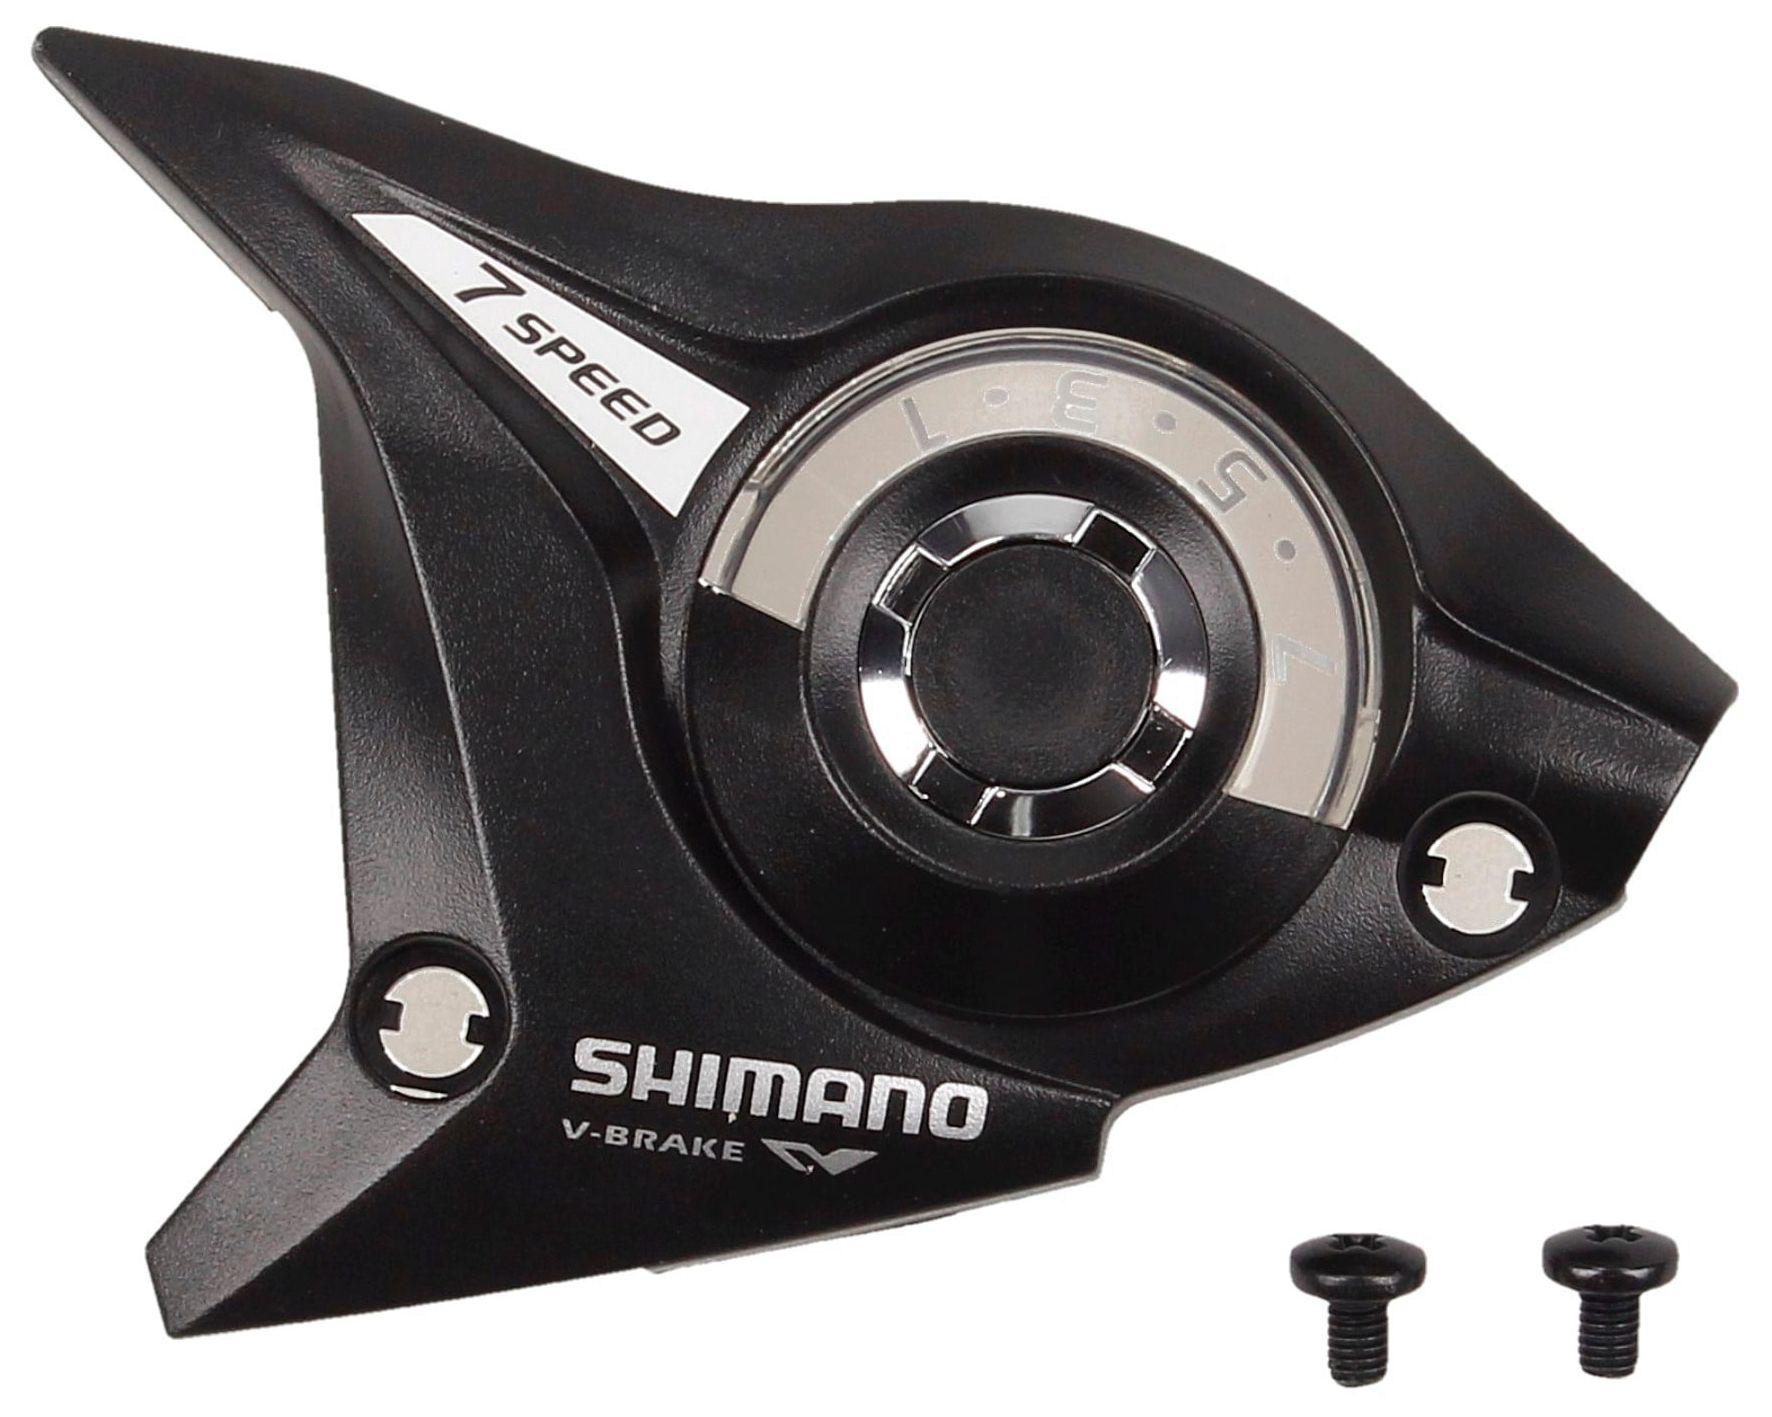 Товар Shimano крышка моноблока ST-EF51,  переключение  - артикул:285961